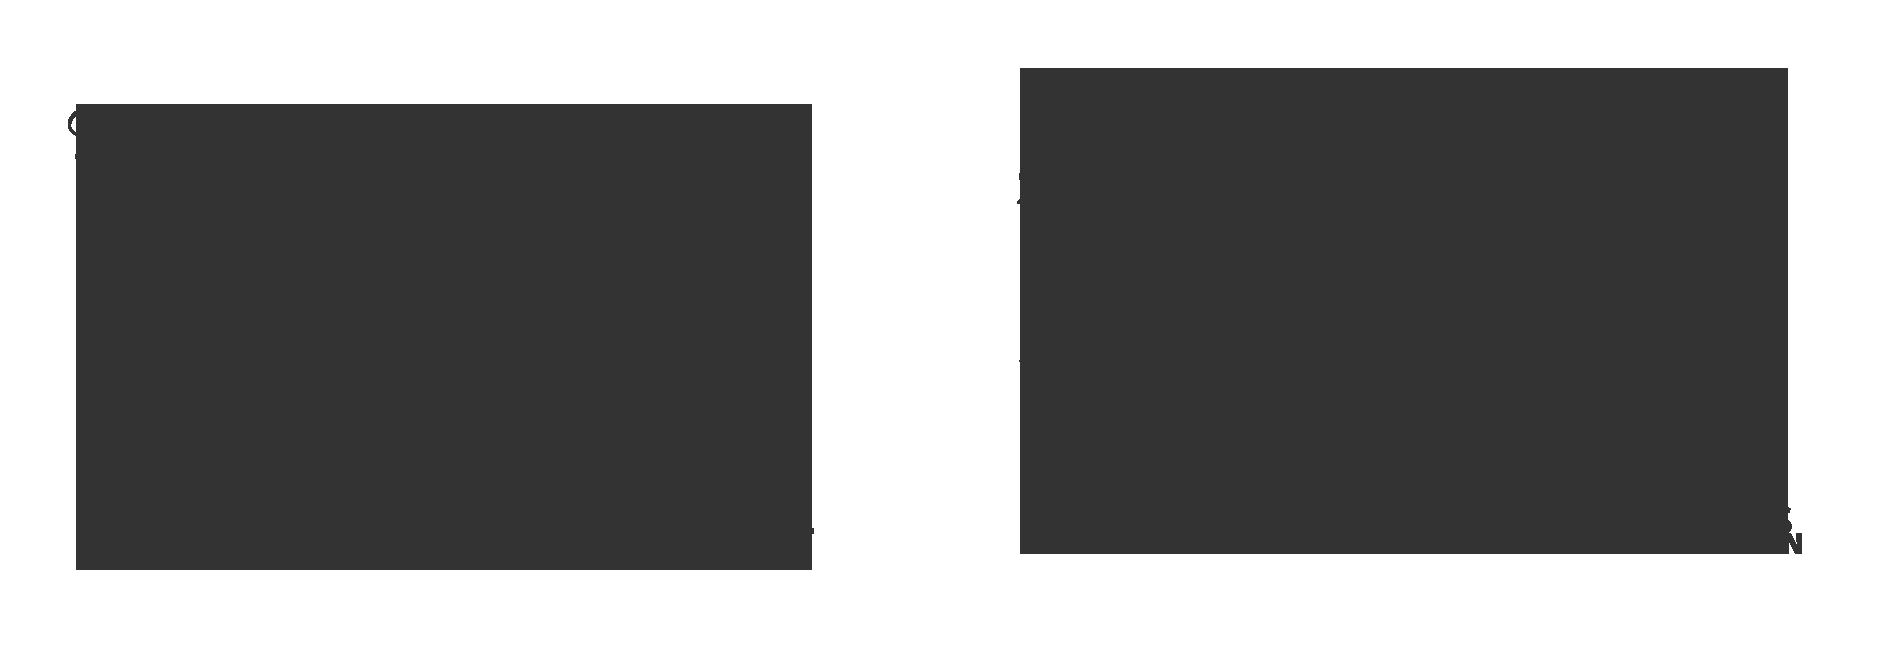 Frames brand logos